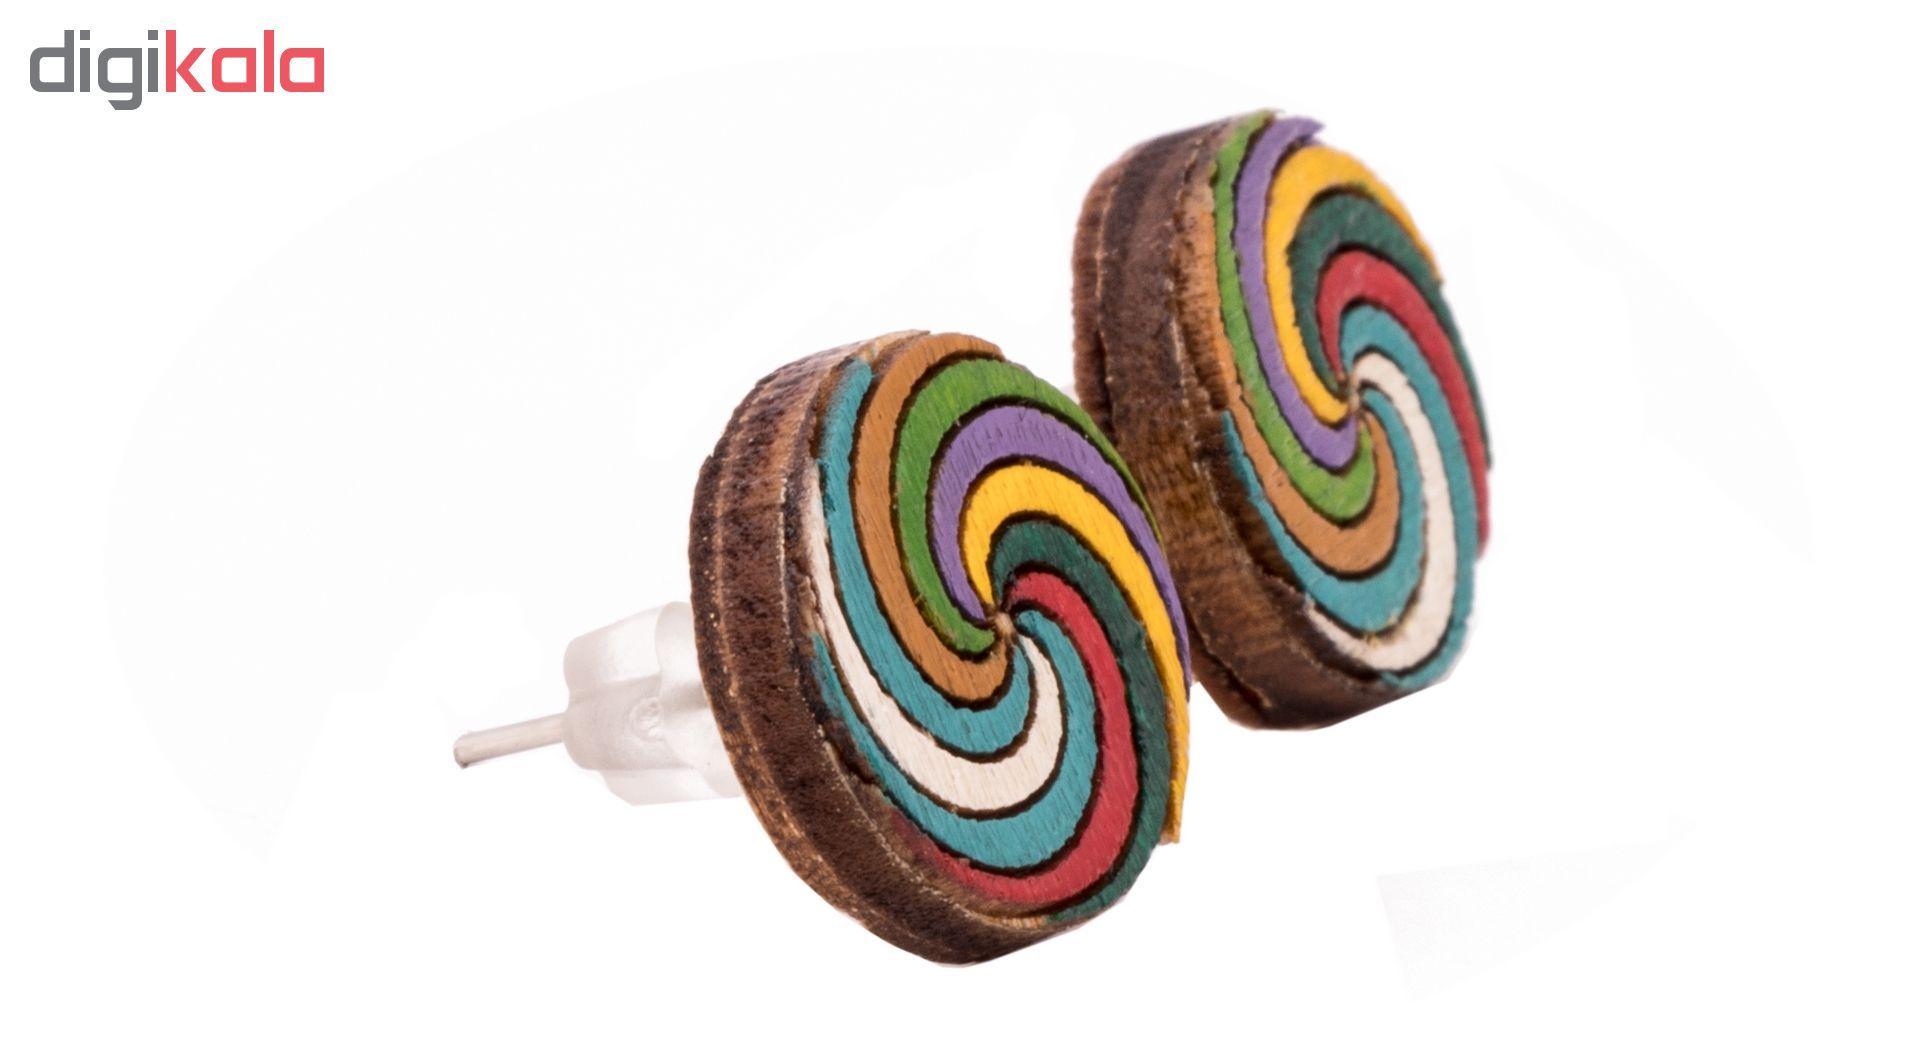 گوشواره چوبی میخی طرح رنگارنگ 2 main 1 3